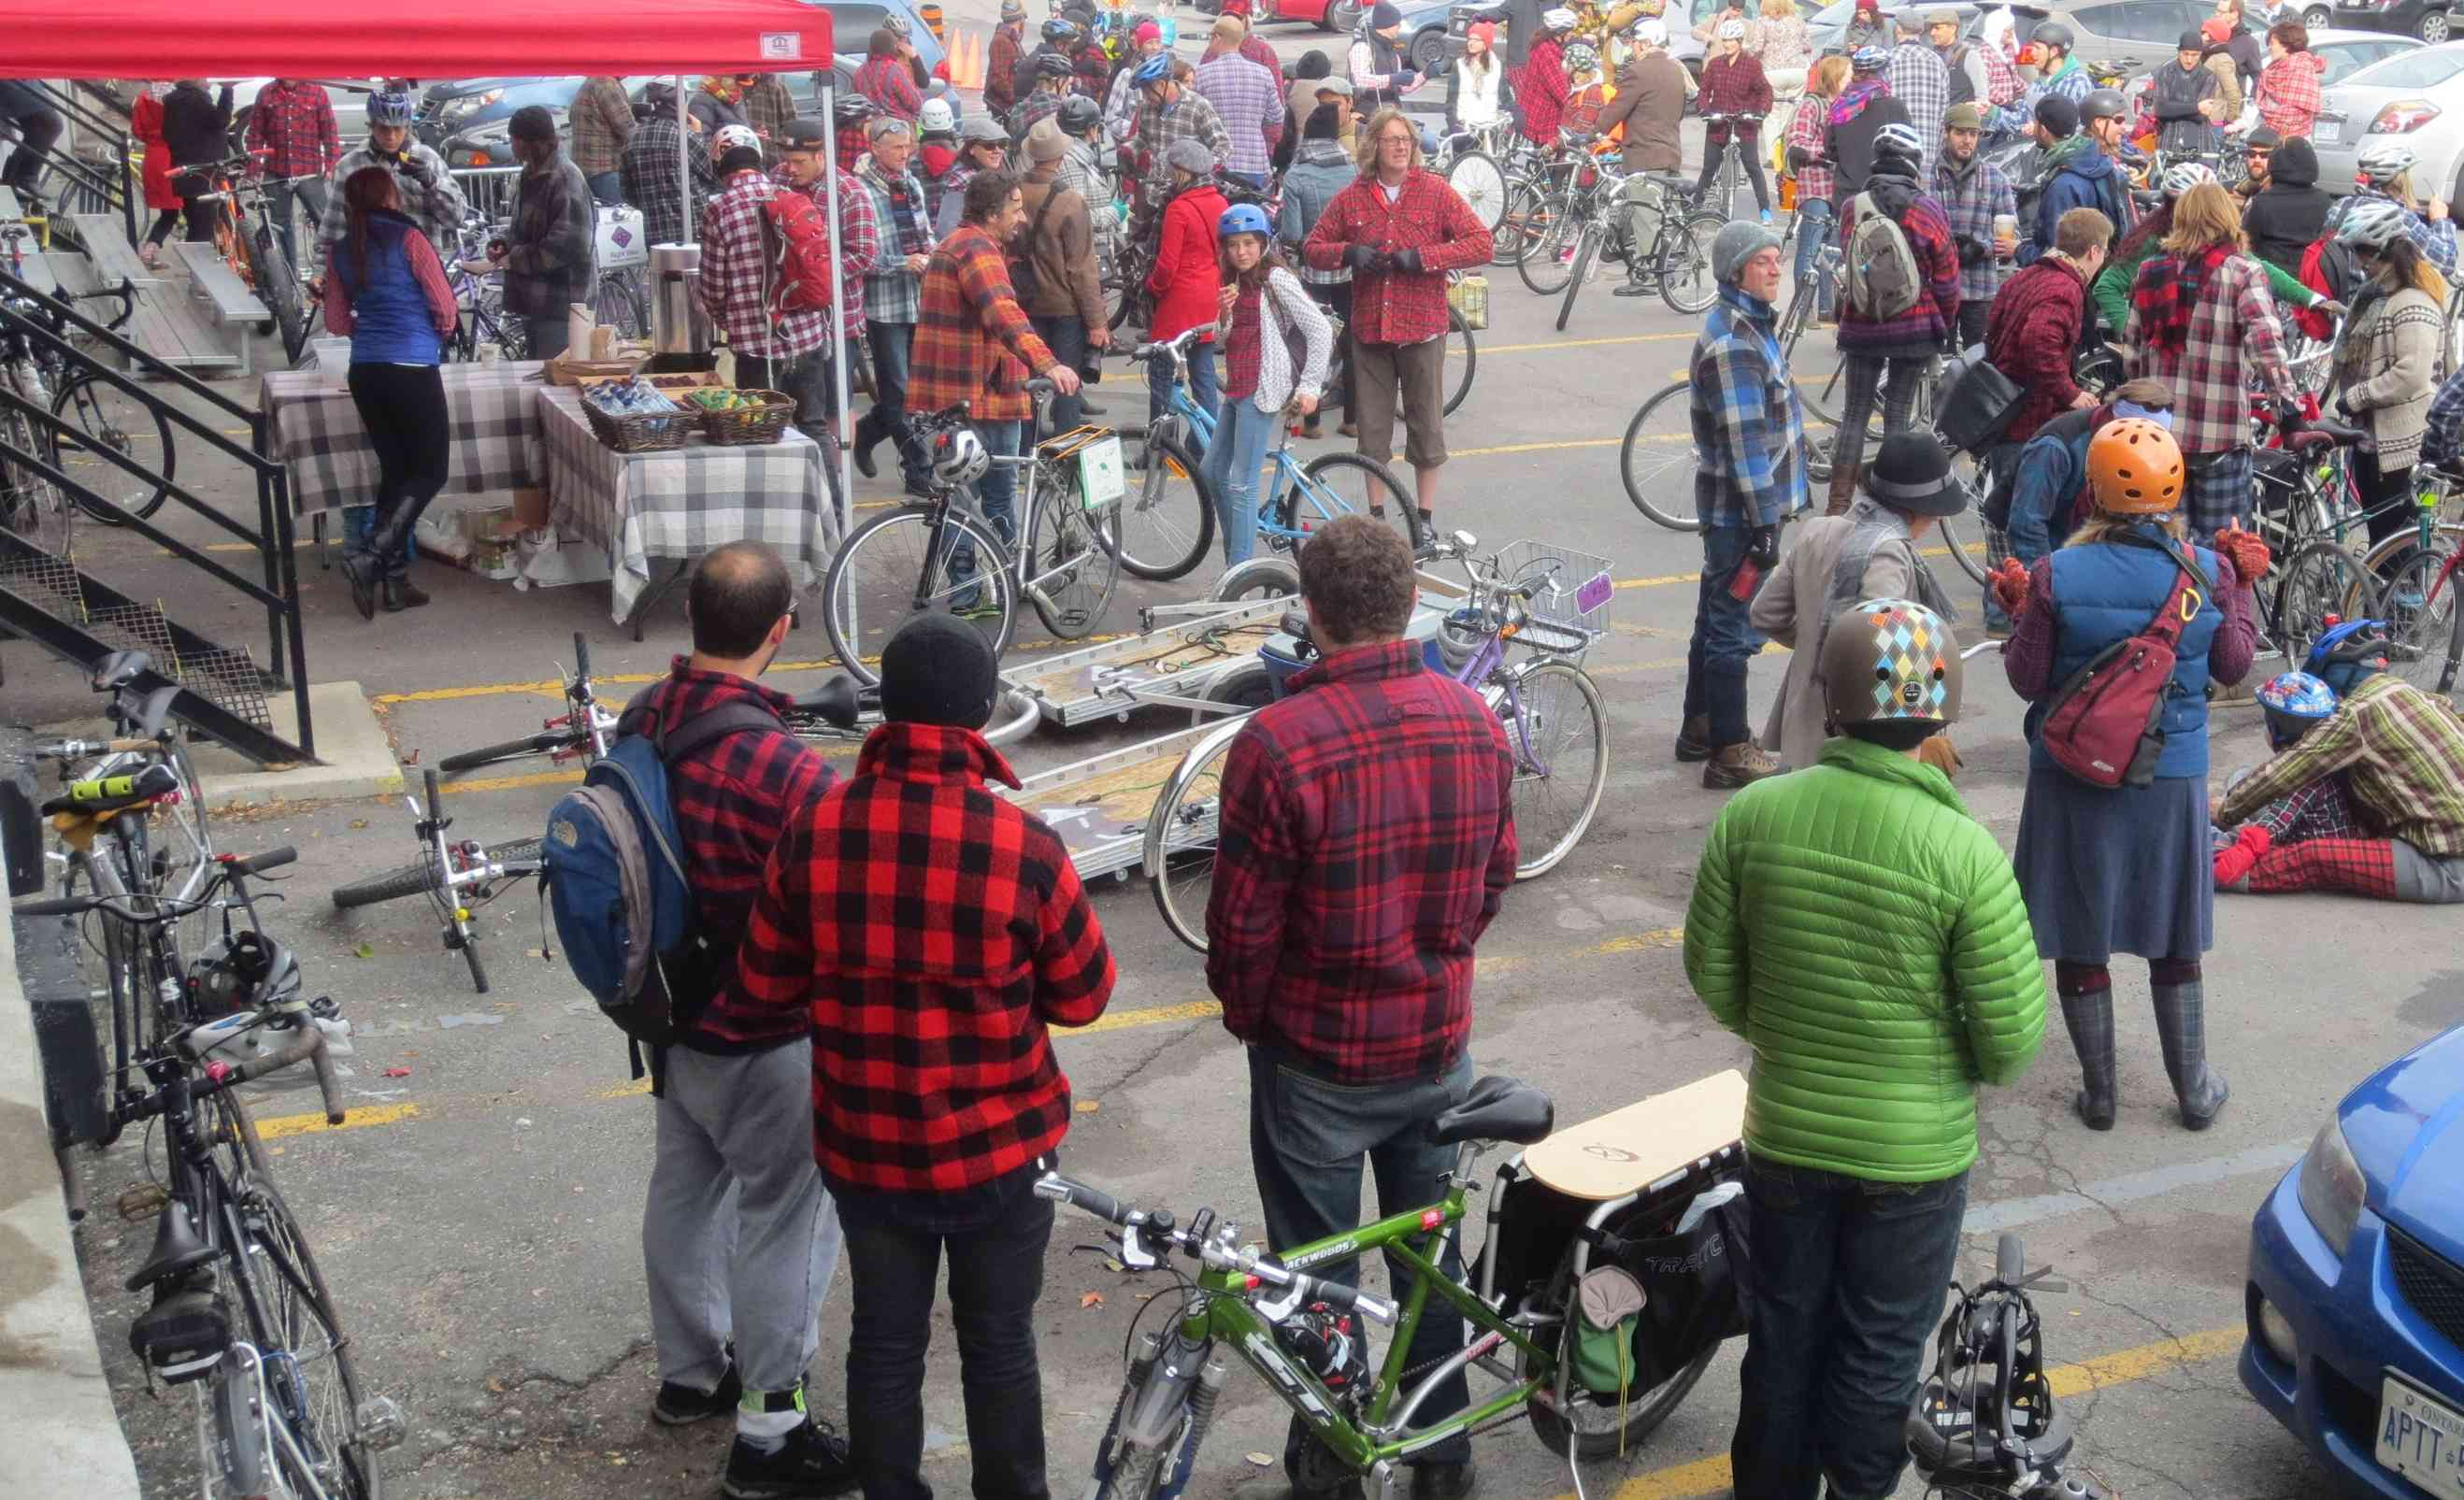 2013 10 27 Ottawa Plaid Parade – Hans Moor 08